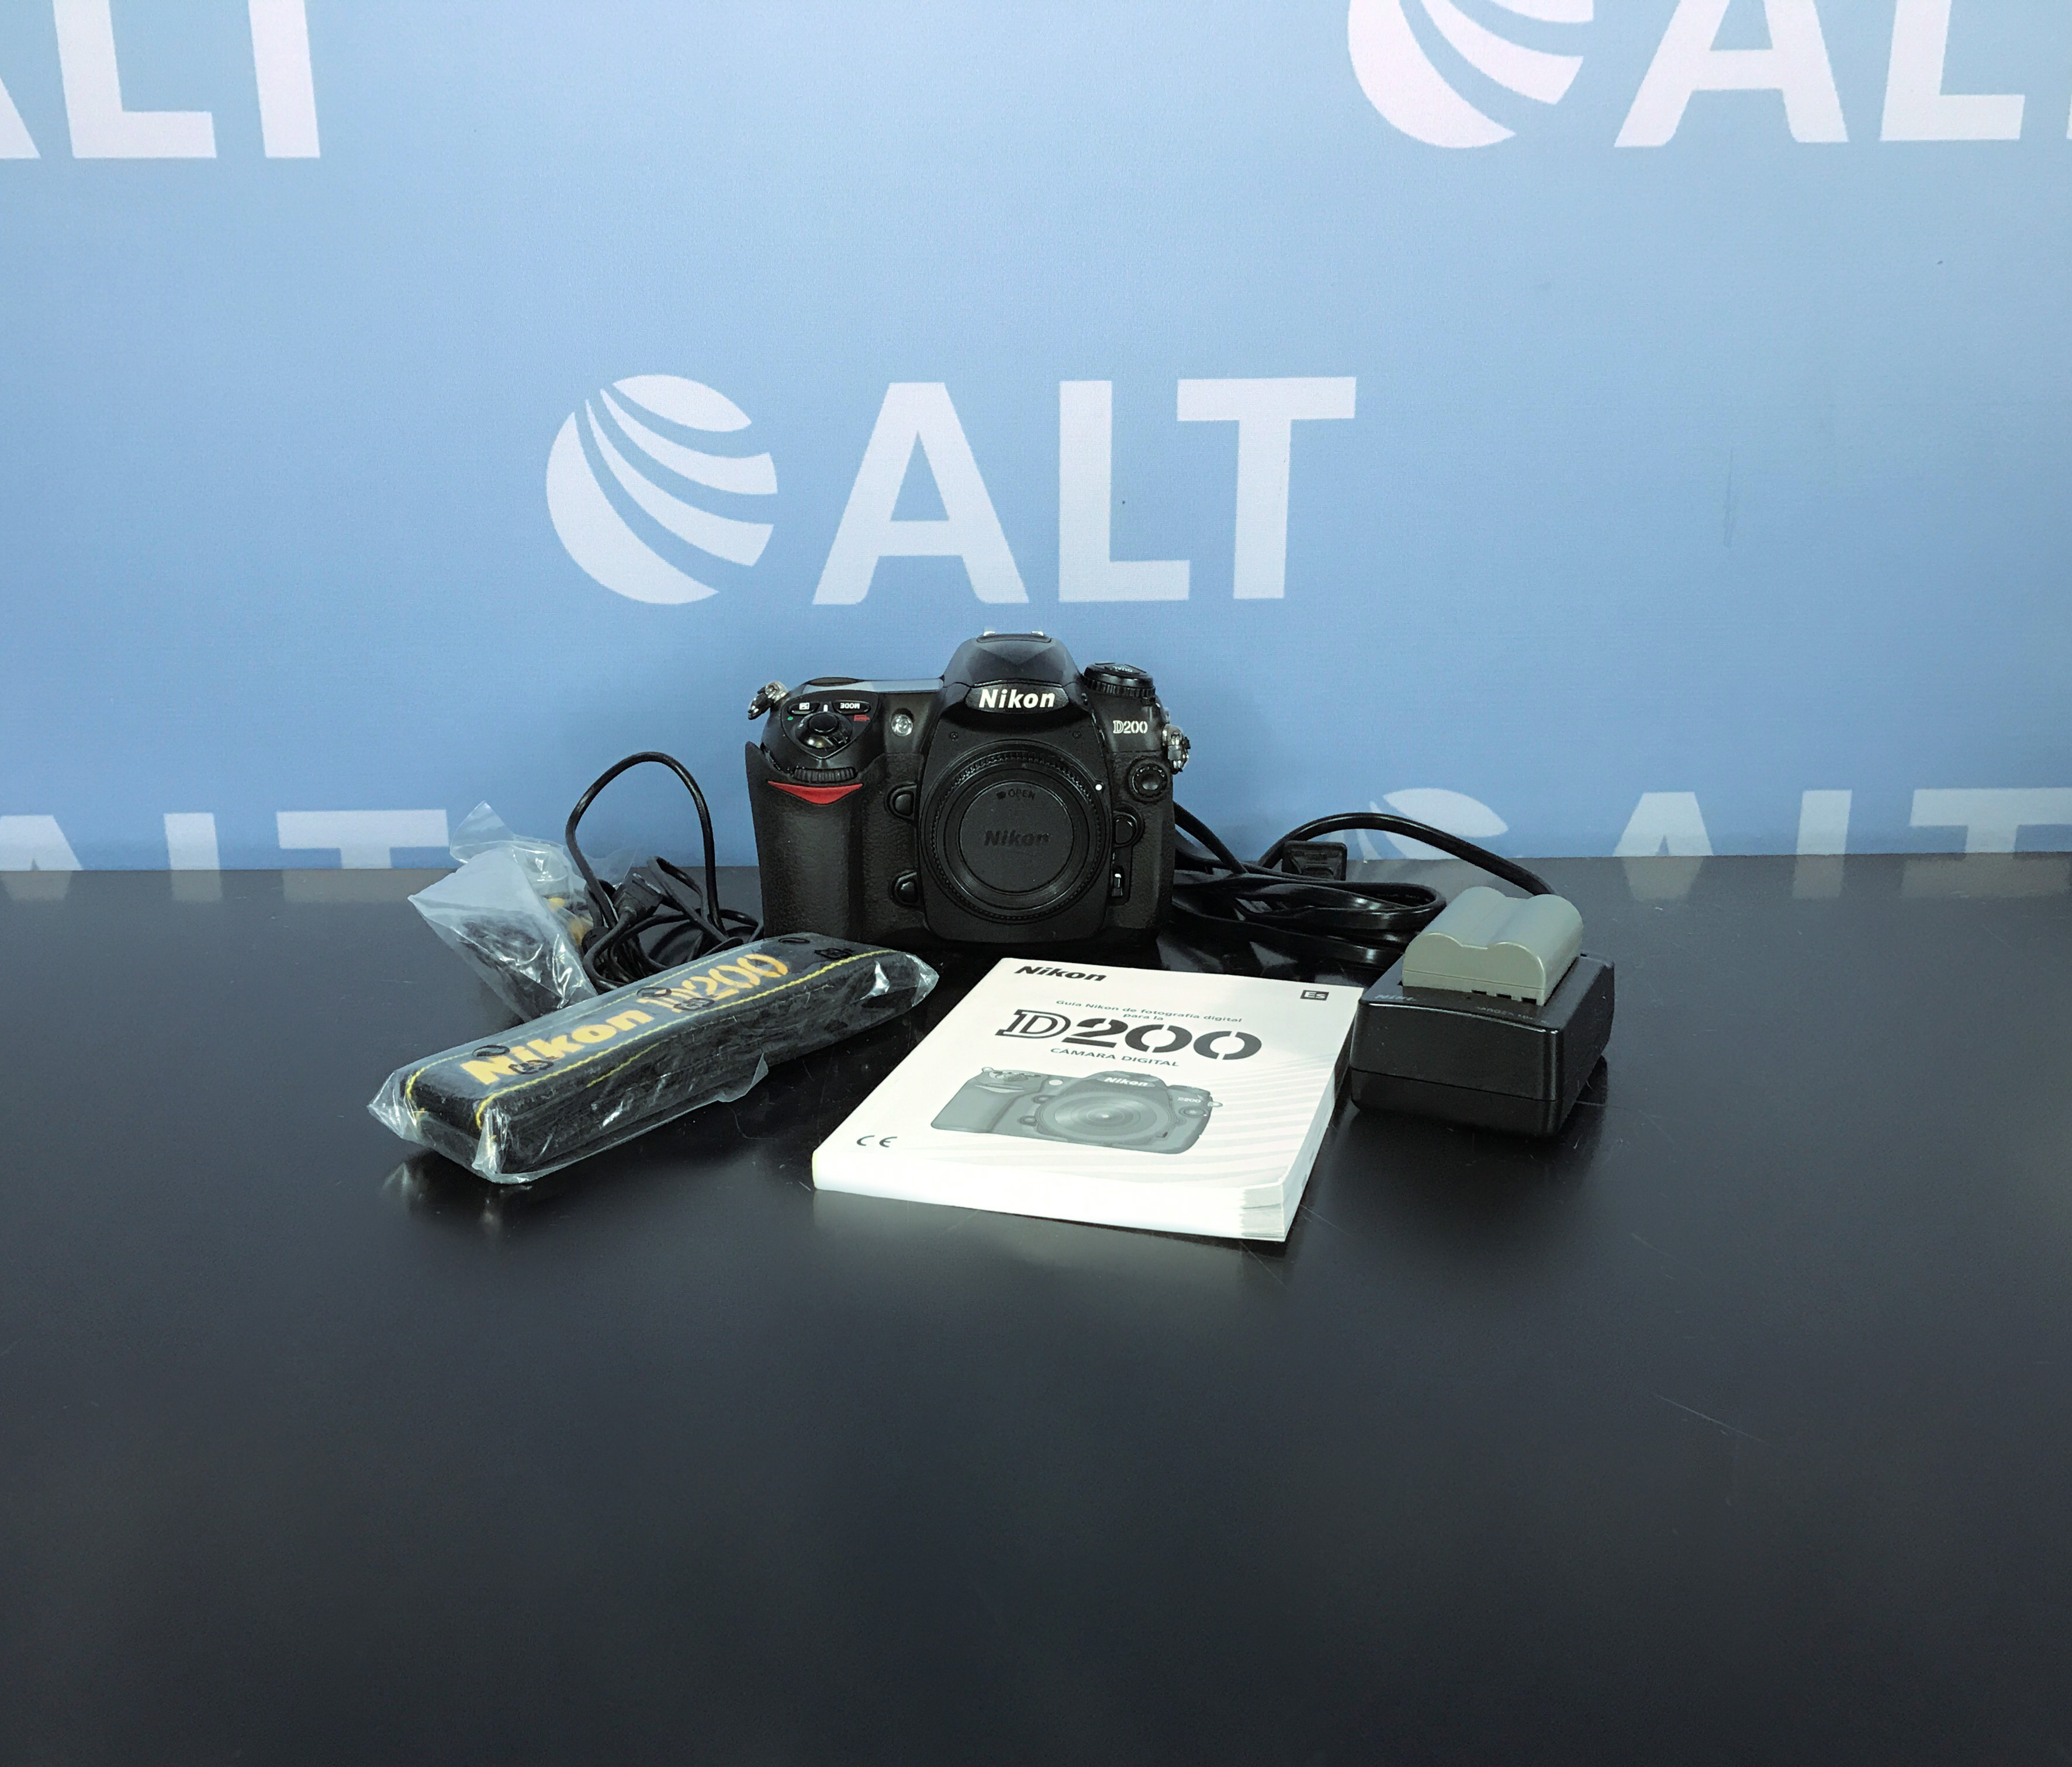 Nikon D200 Digital SLR Camera Image